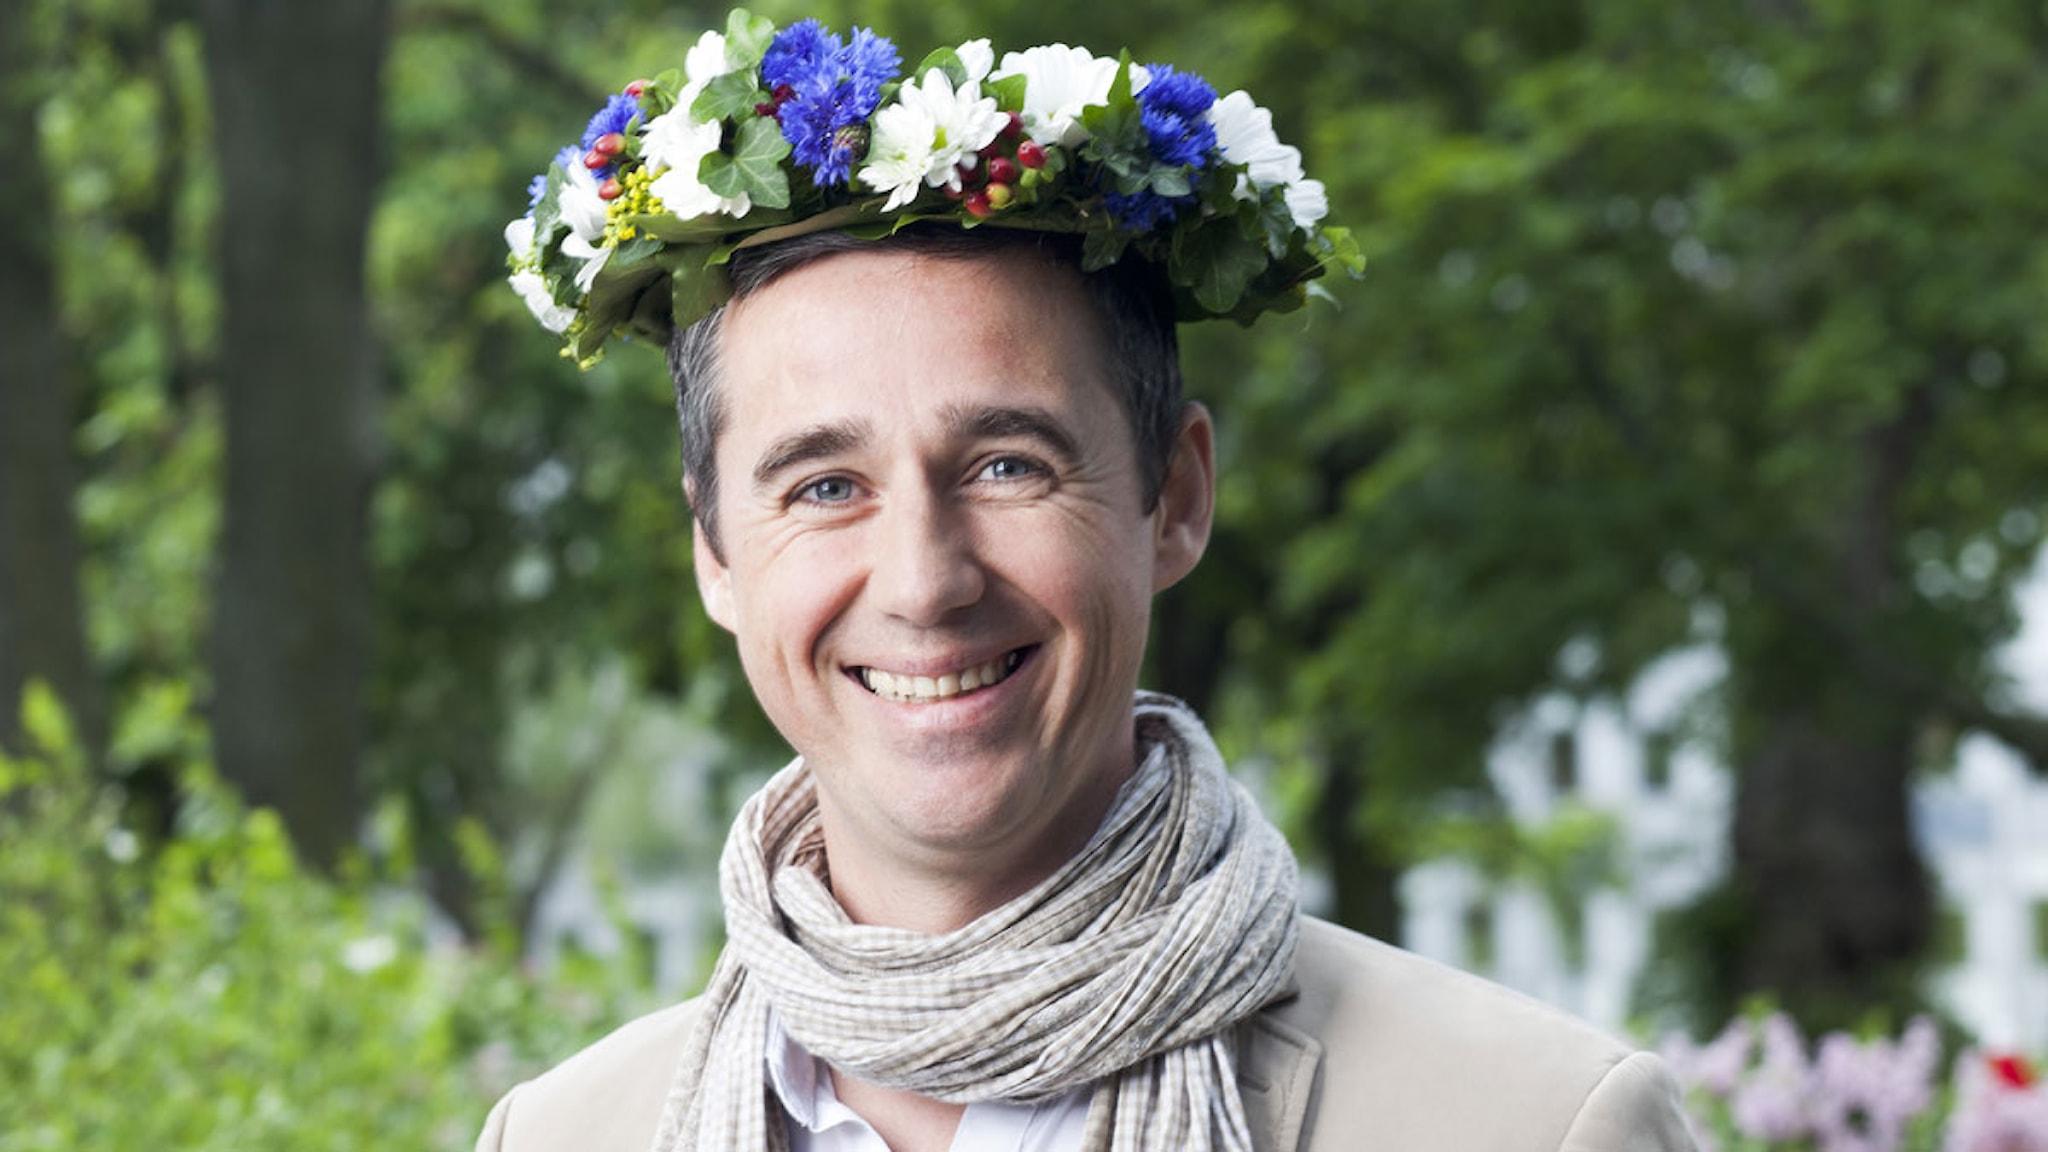 Sébastien Boudet foto: Mattias Ahlm/Sveriges Radio